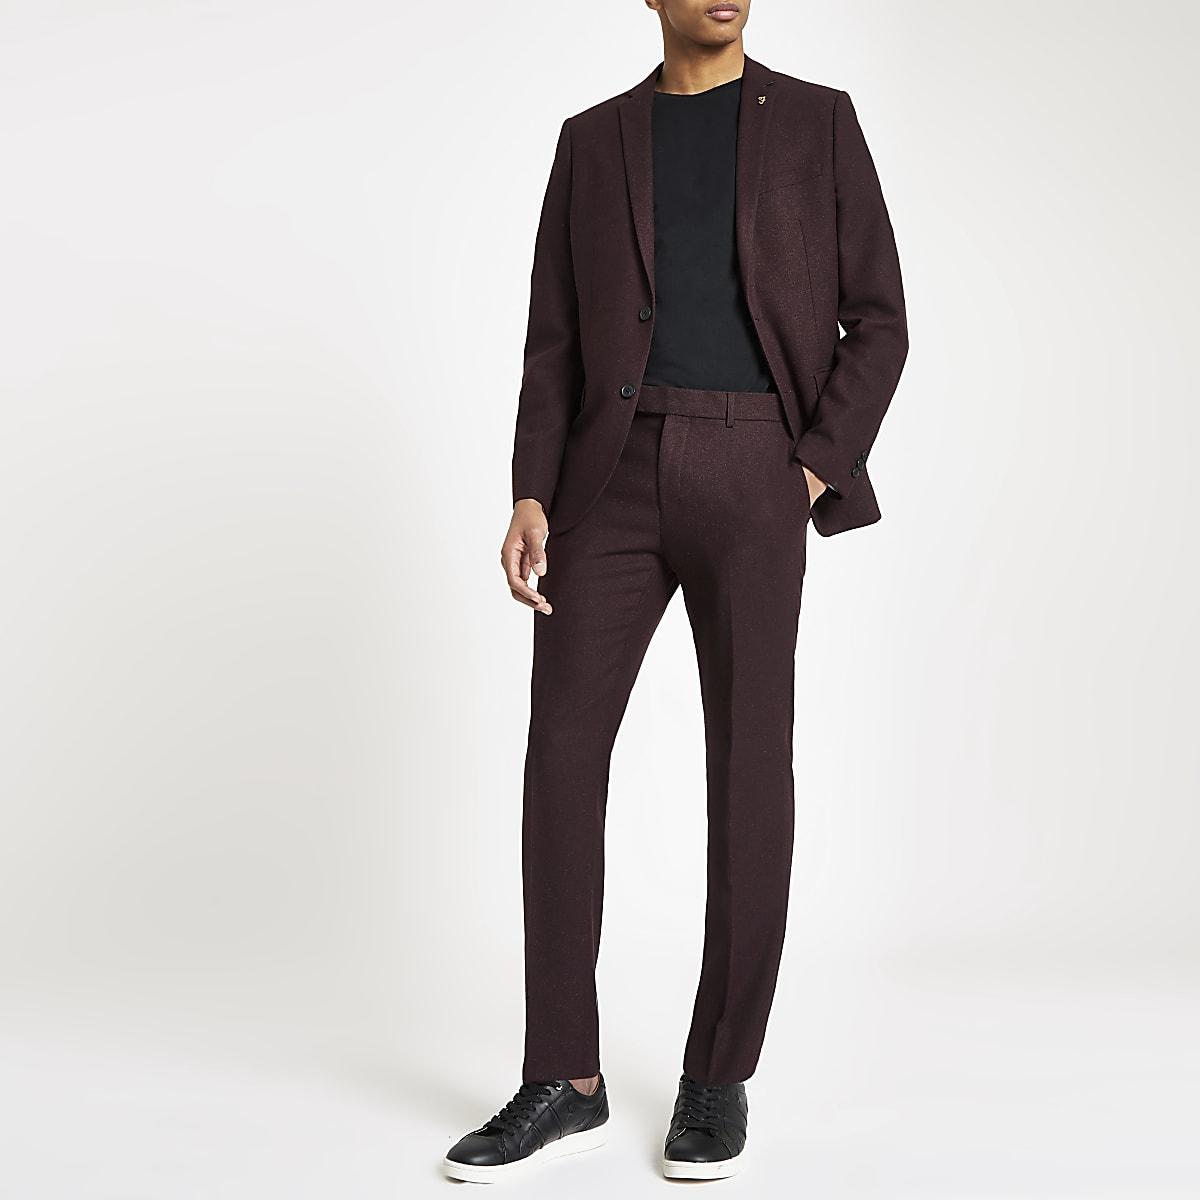 Farah – Pantalon de costume skinny natté bordeaux